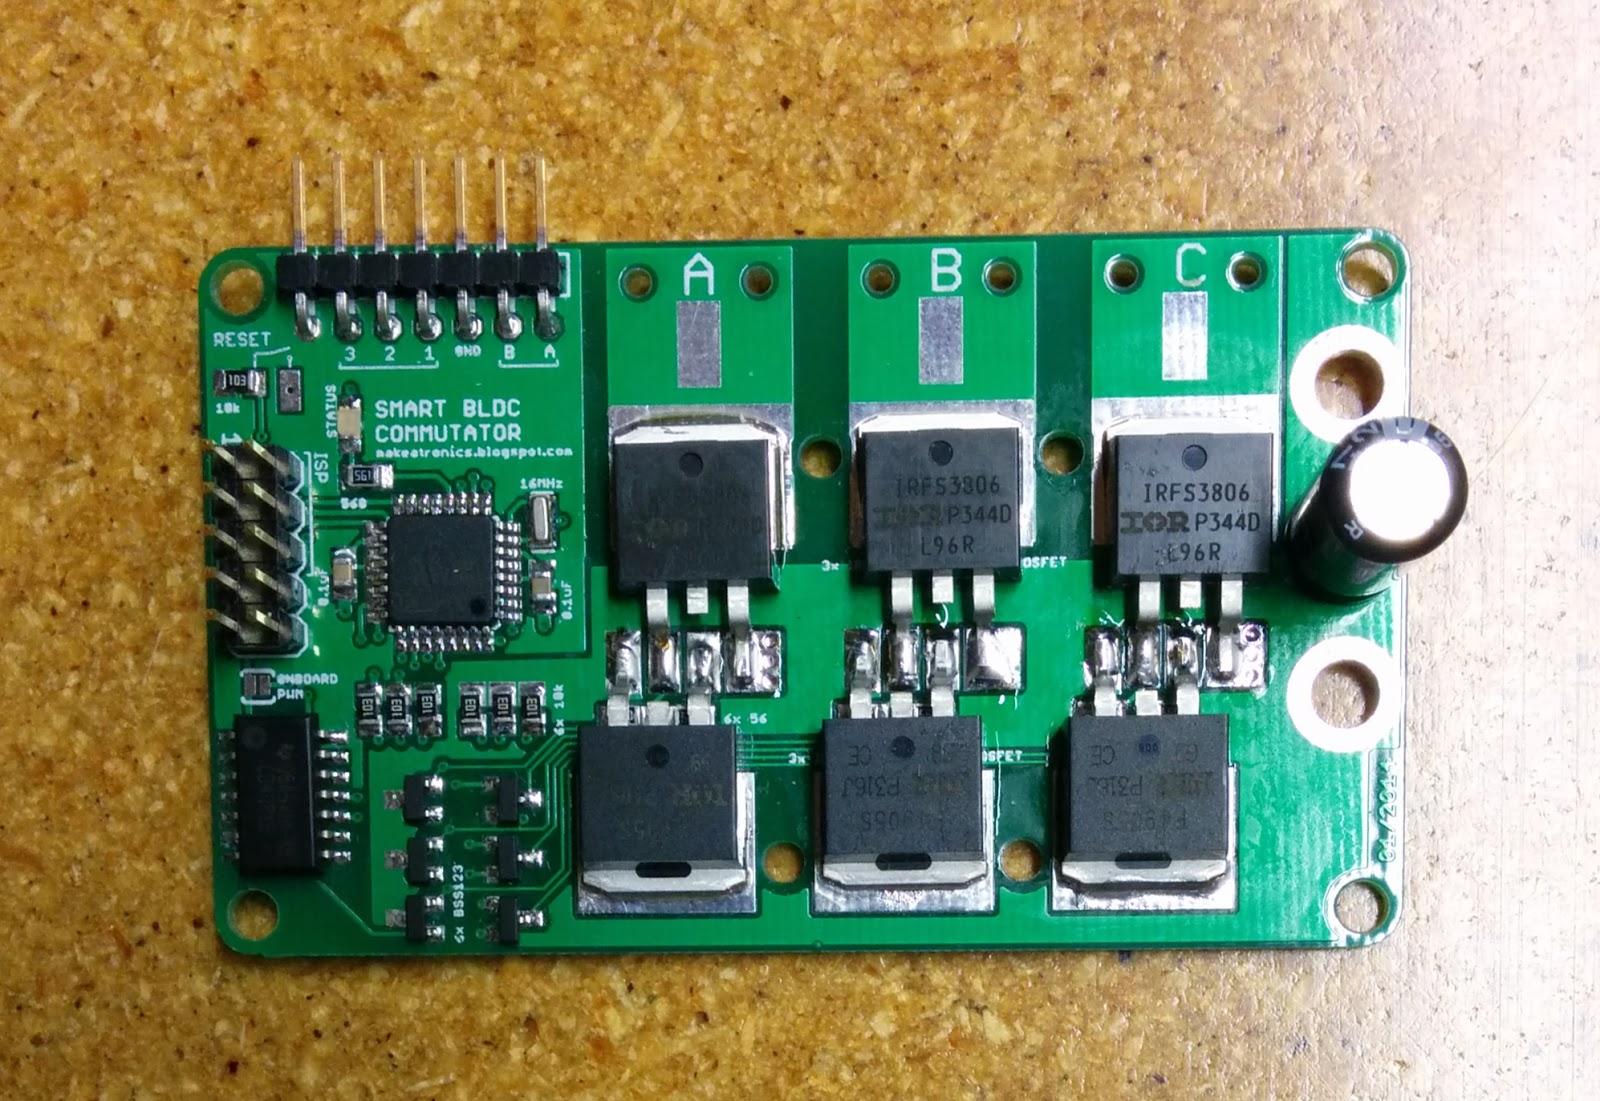 Brushless Dc Motor Control Ic Protector 9 Controlcircuit Circuit Diagram Seekiccom Makeatronics Bldc